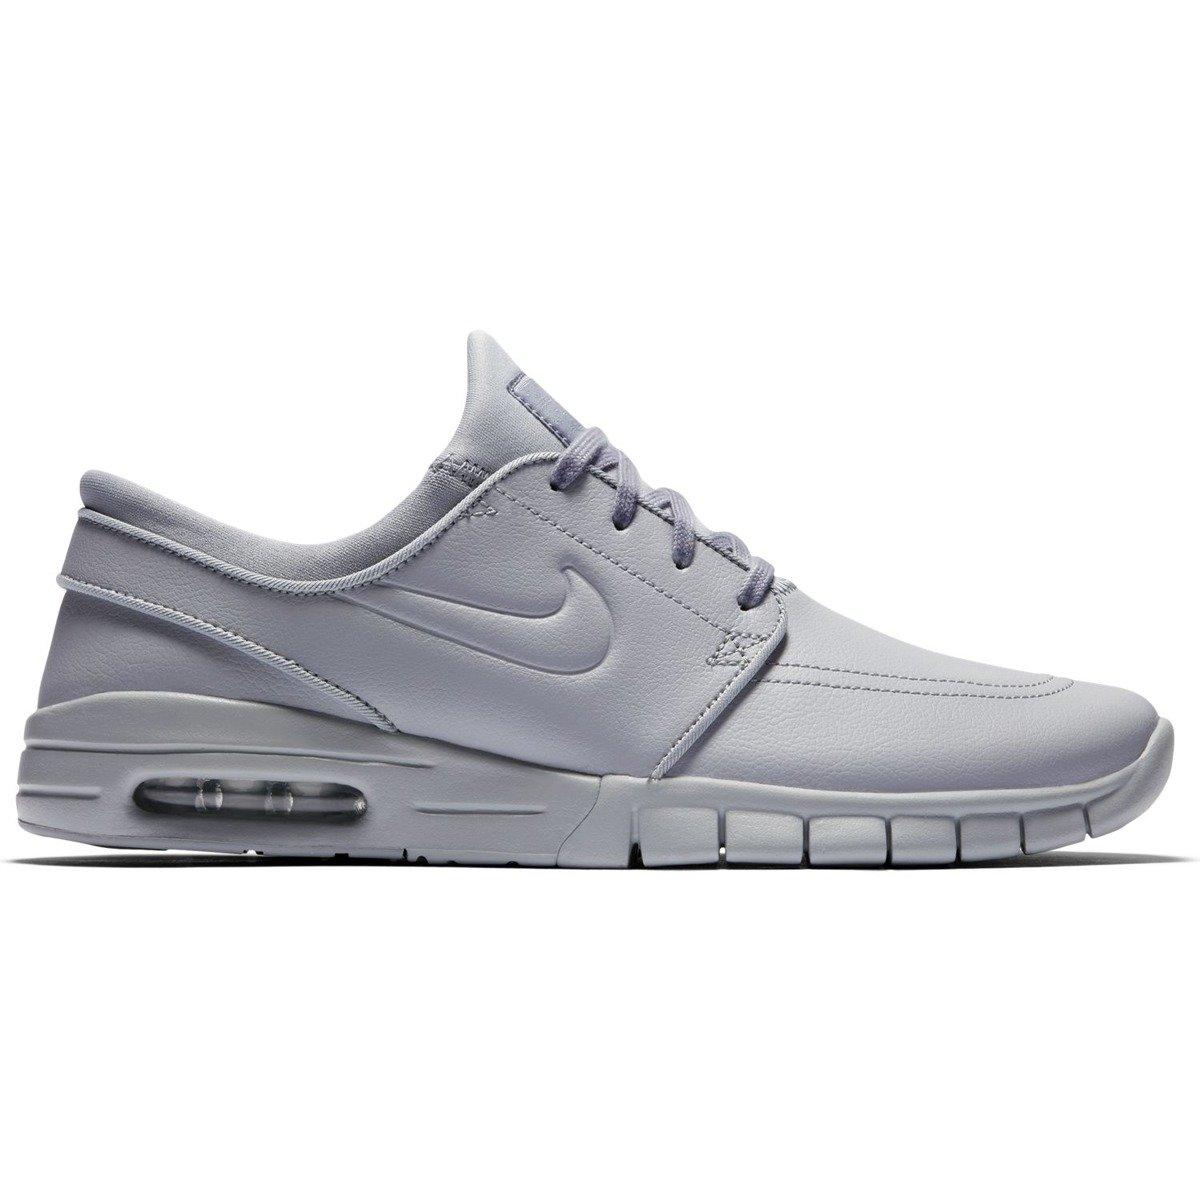 149af4dab eng_pl_shoes-nike-stefan-janoski-max-l-skateboarding-shoe-wolf-grey-wolf-grey-mtlc-pewter-15871_5.jpg